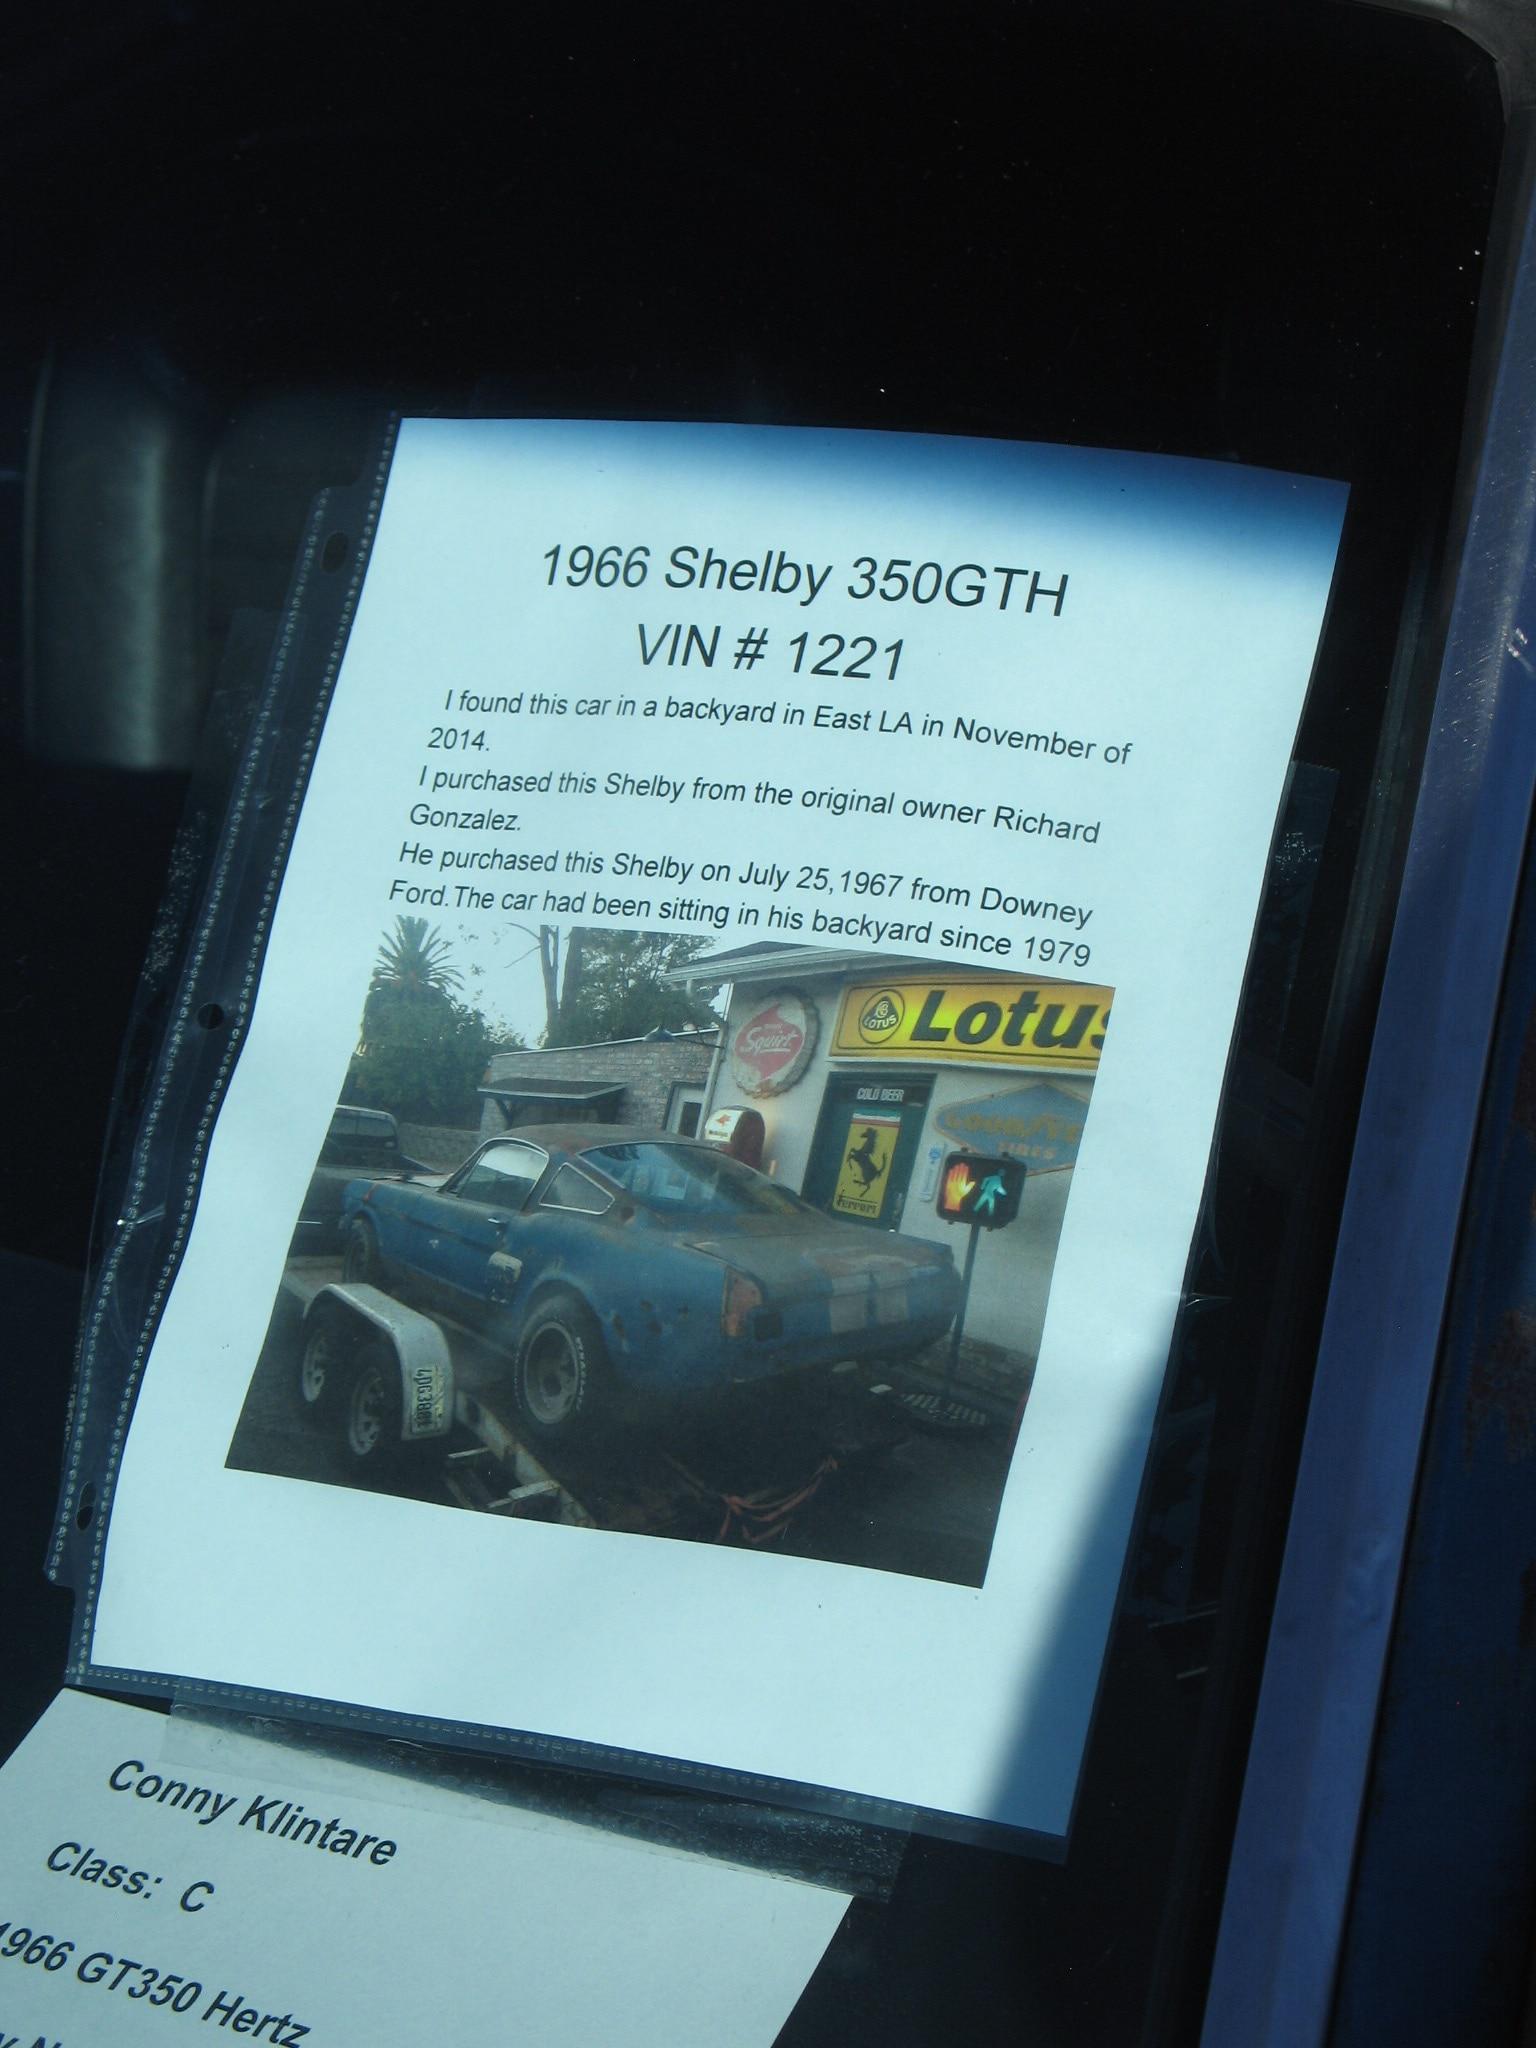 2016 Shelbys On Santa Monica Pier Lasaac 15